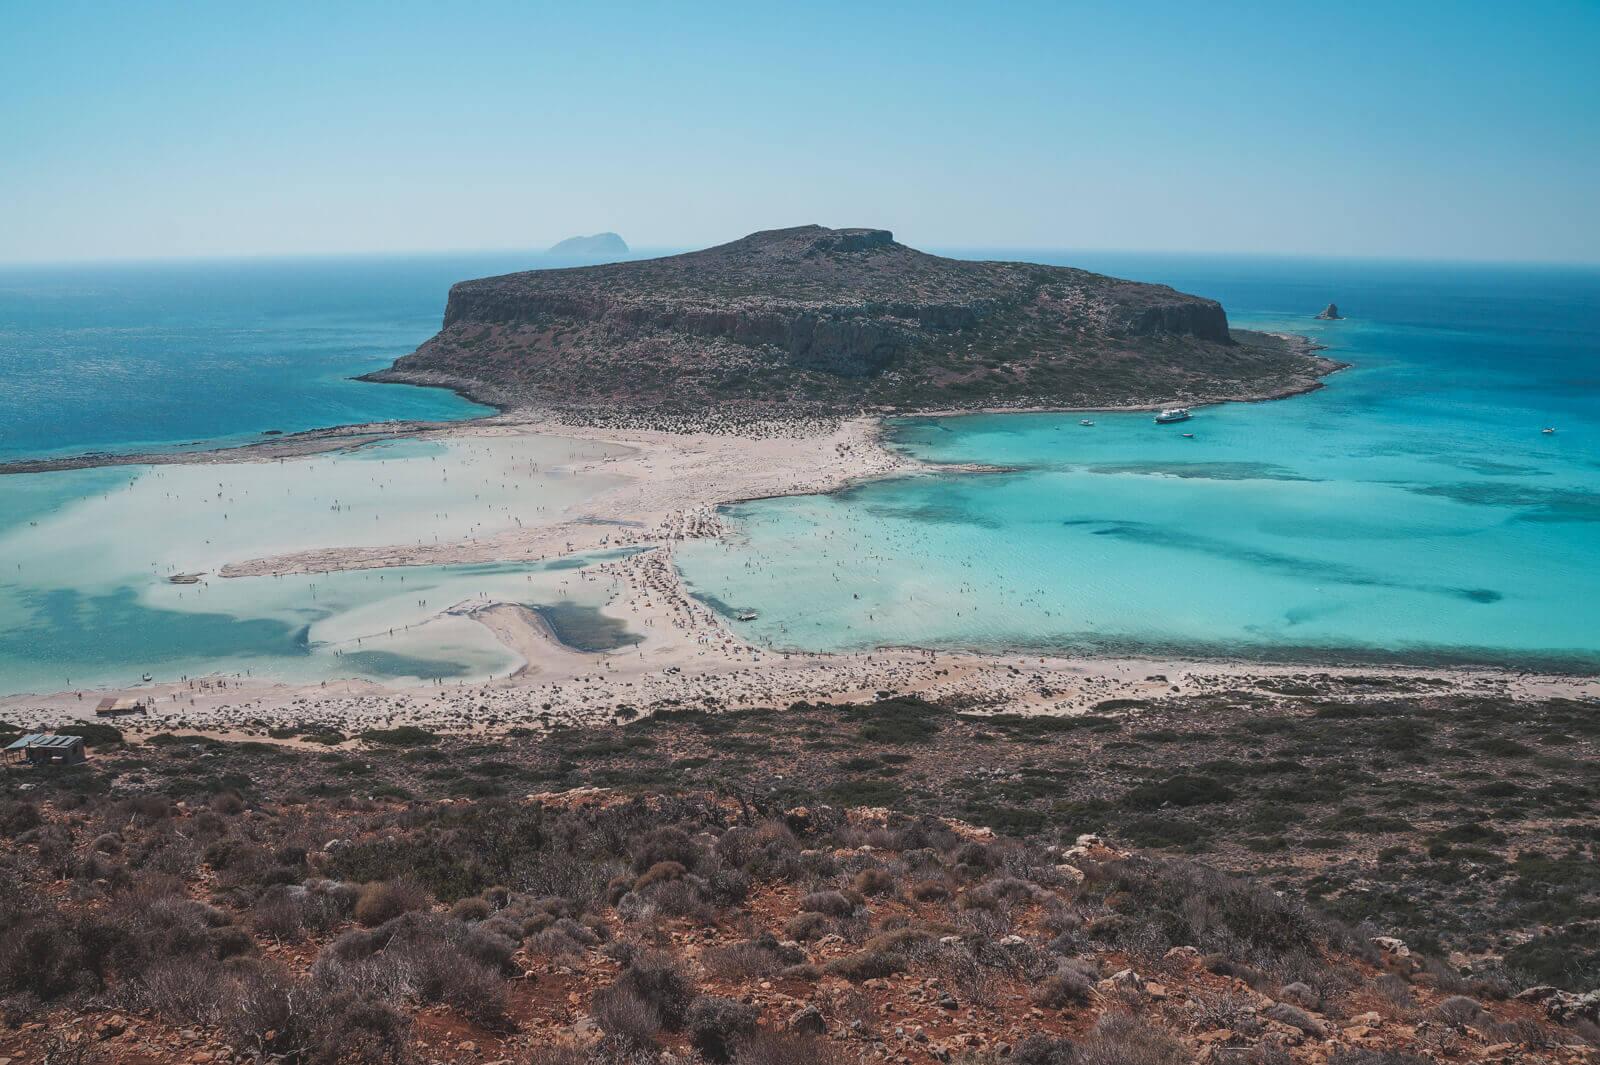 crete-greece-la-vie-en-blog-all-rights-reserved-9